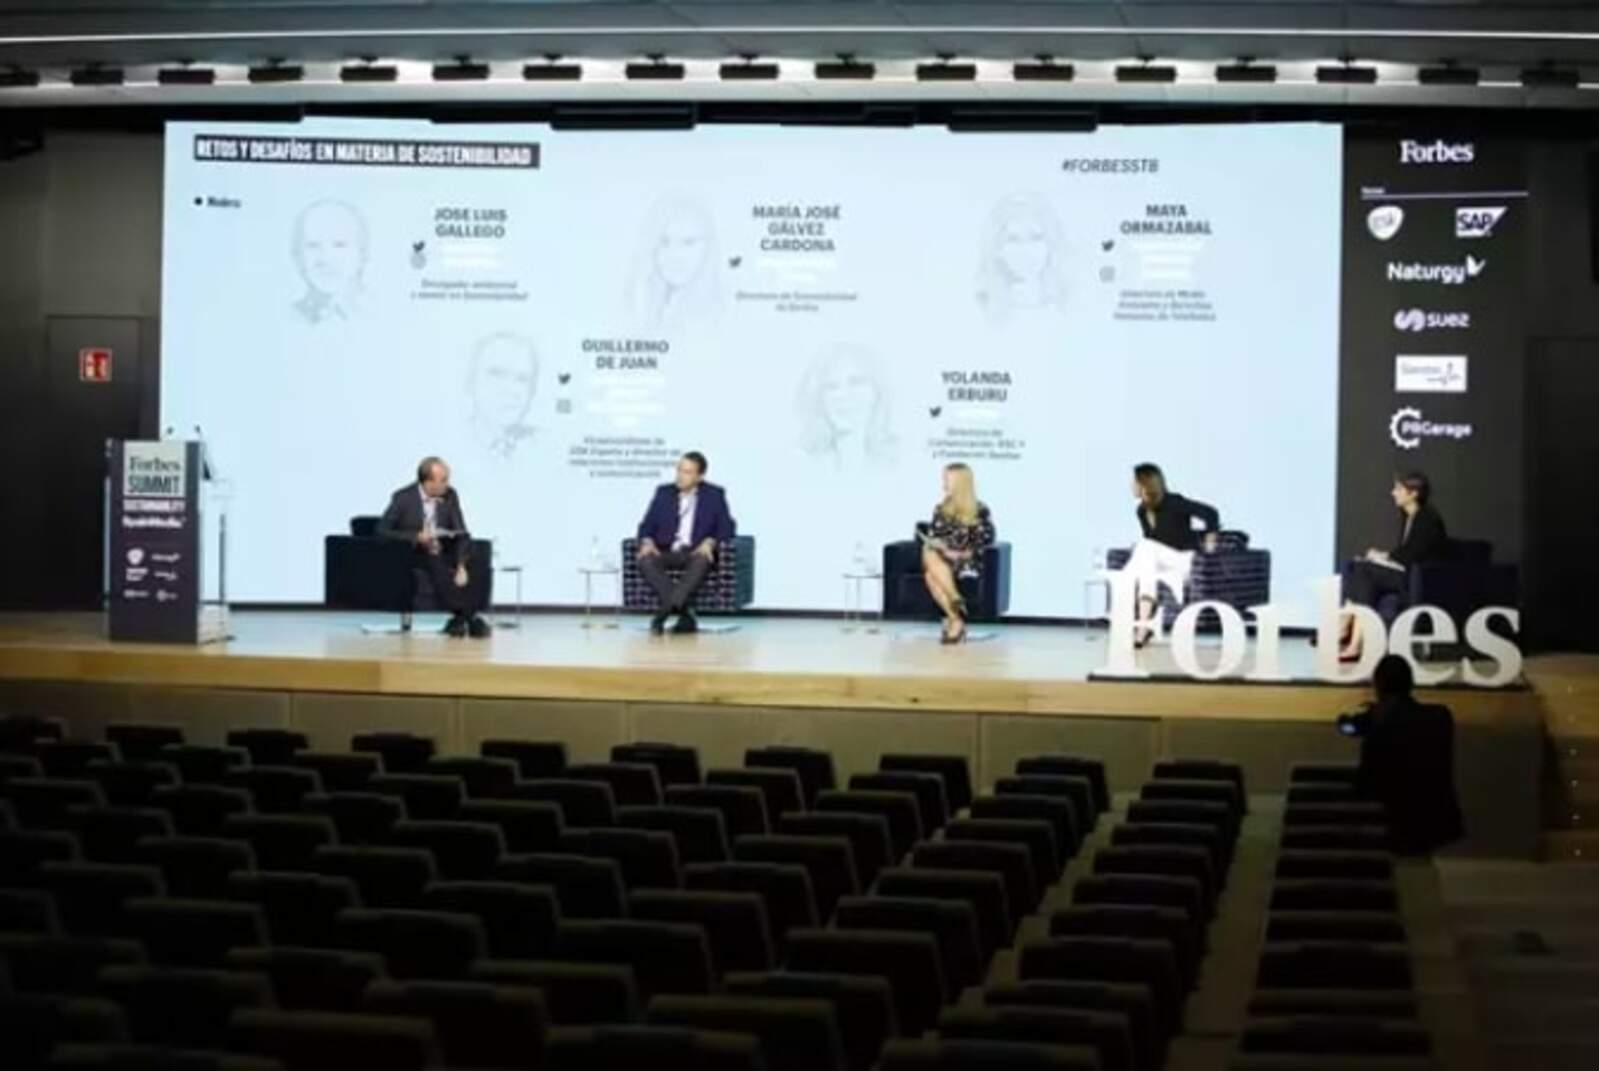 Forbes Summit Sustainability